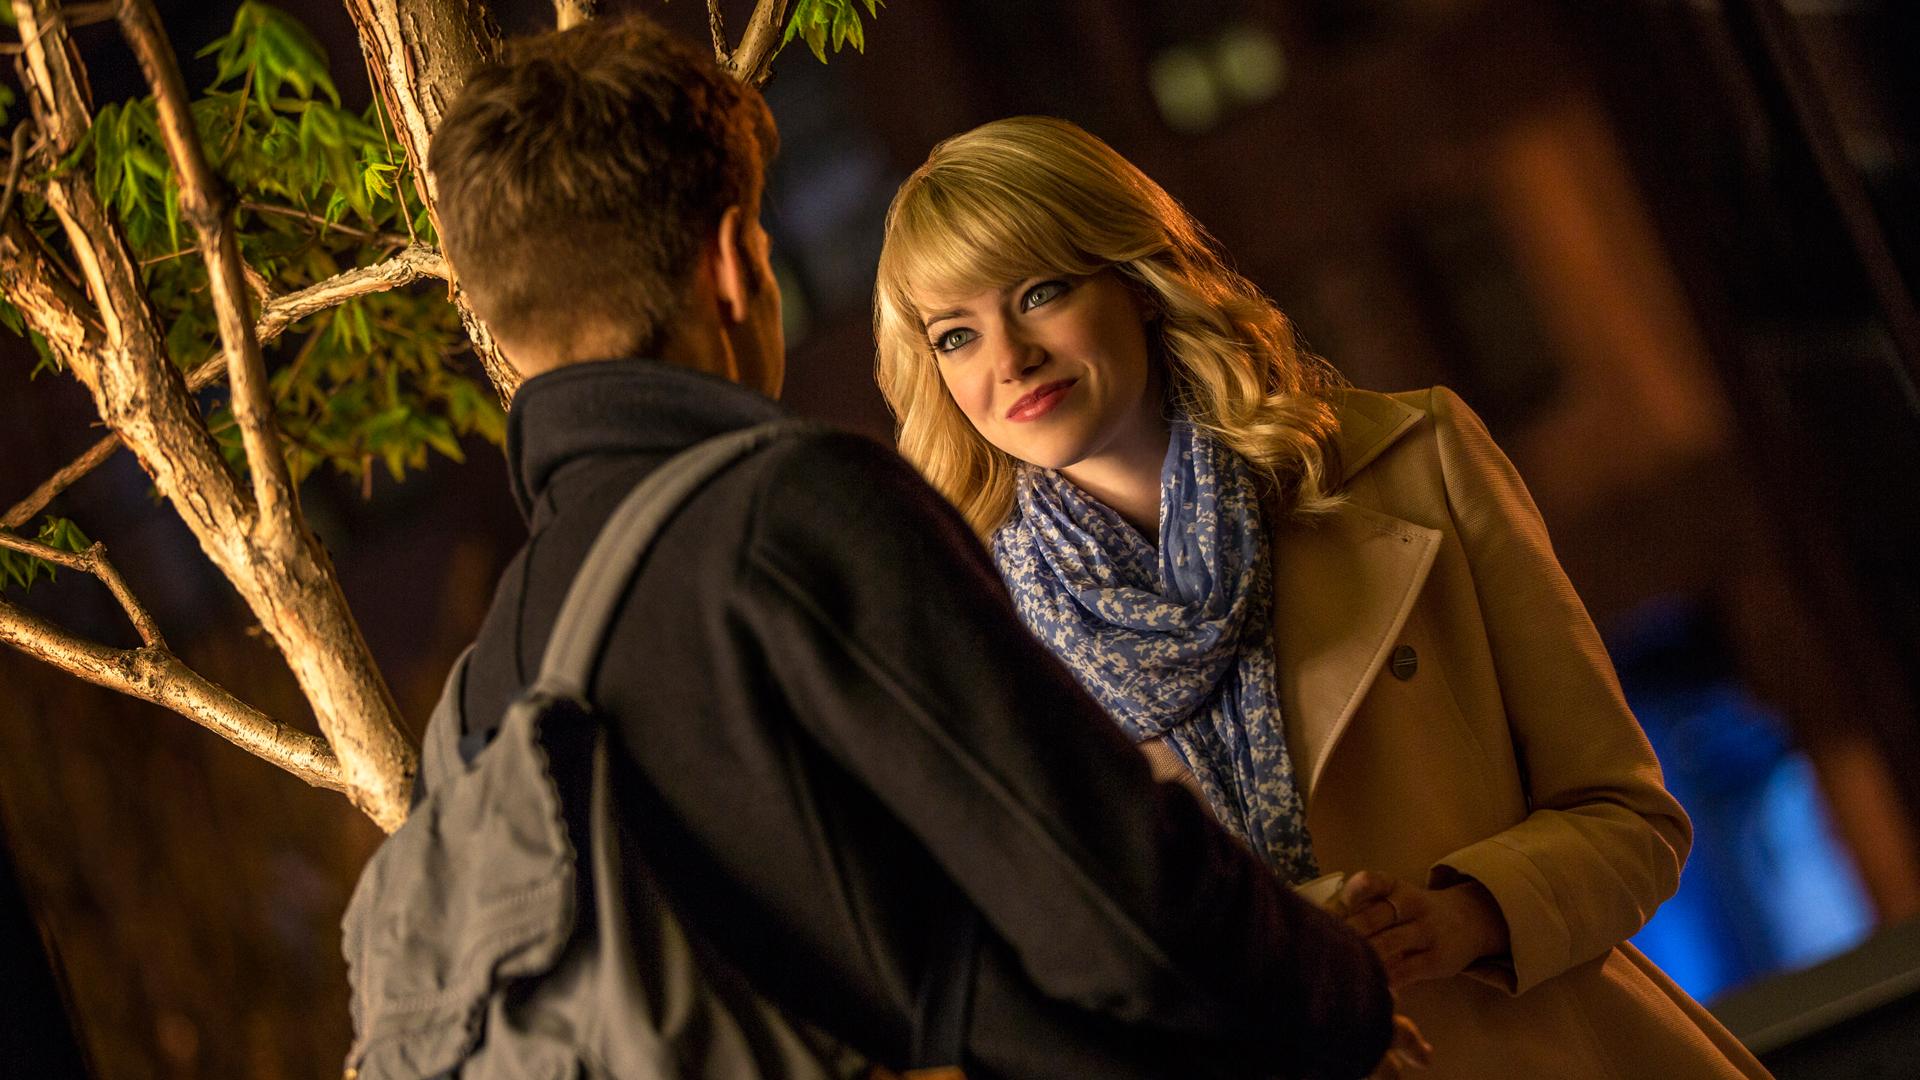 Emma Stone and Andrew Garfield 1q Wallpaper HD